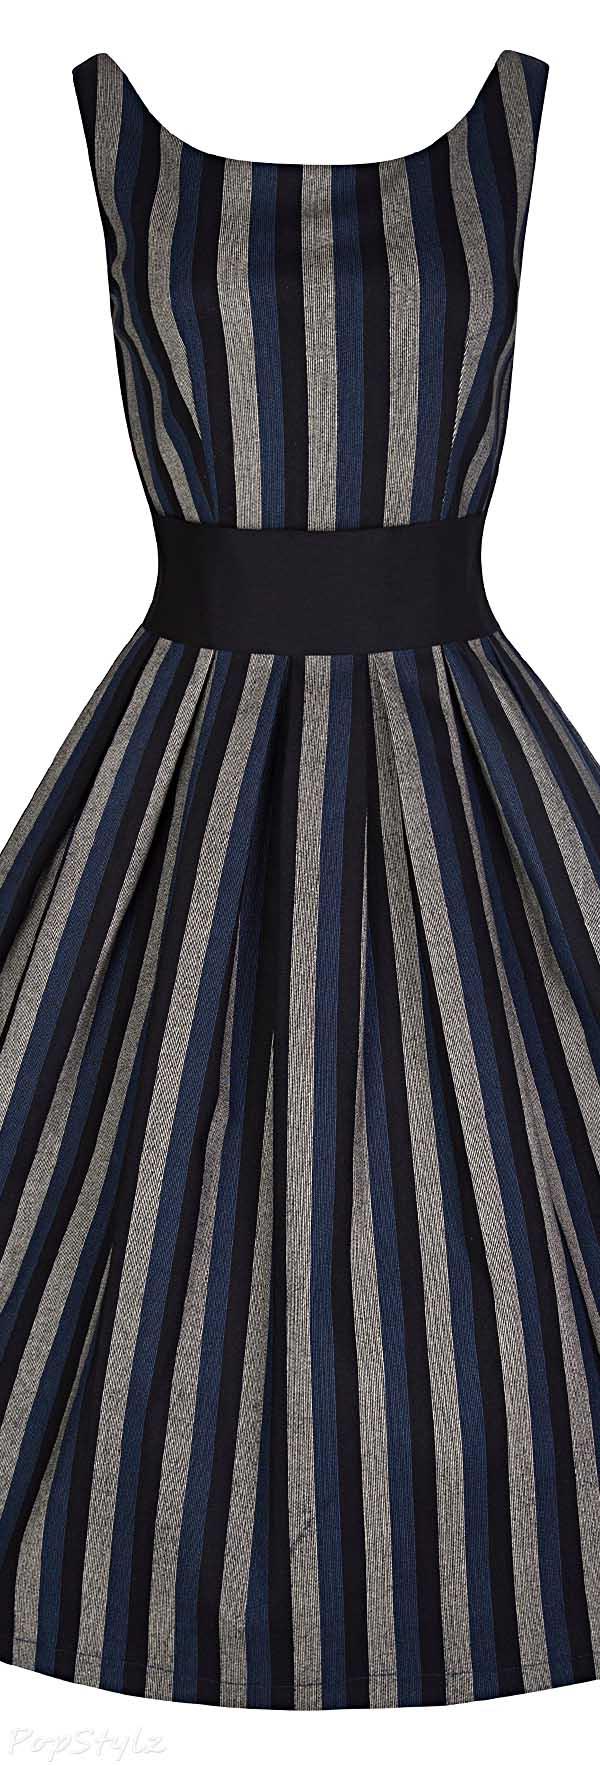 Lindy Bop 'Lana' Vintage 50's Dress & Waspie Waist Belt